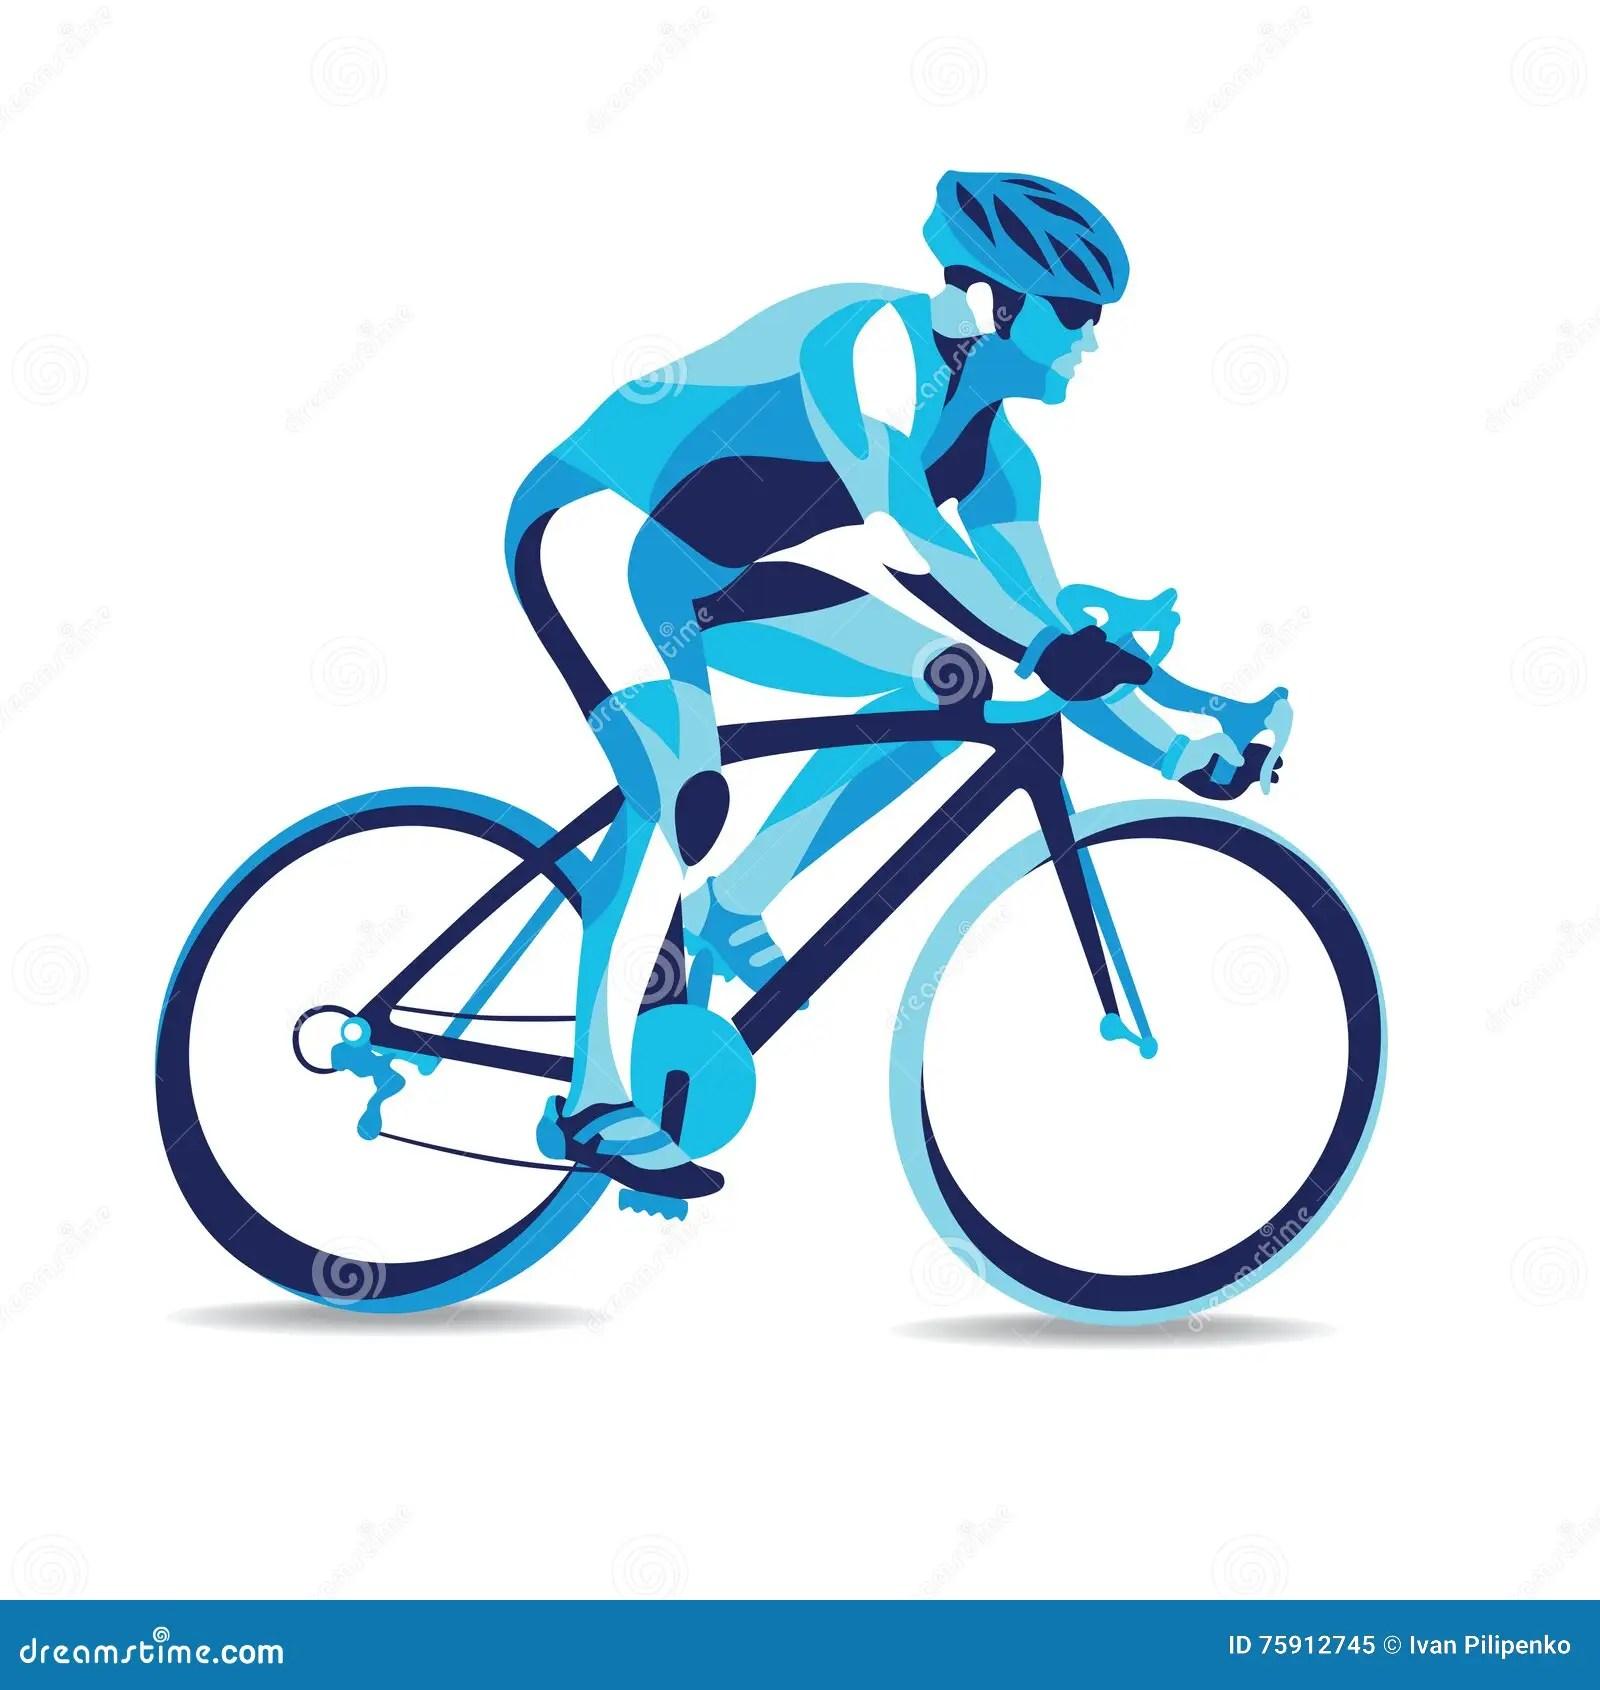 Trendy Stylized Illustration Movement Bicycle Race Line